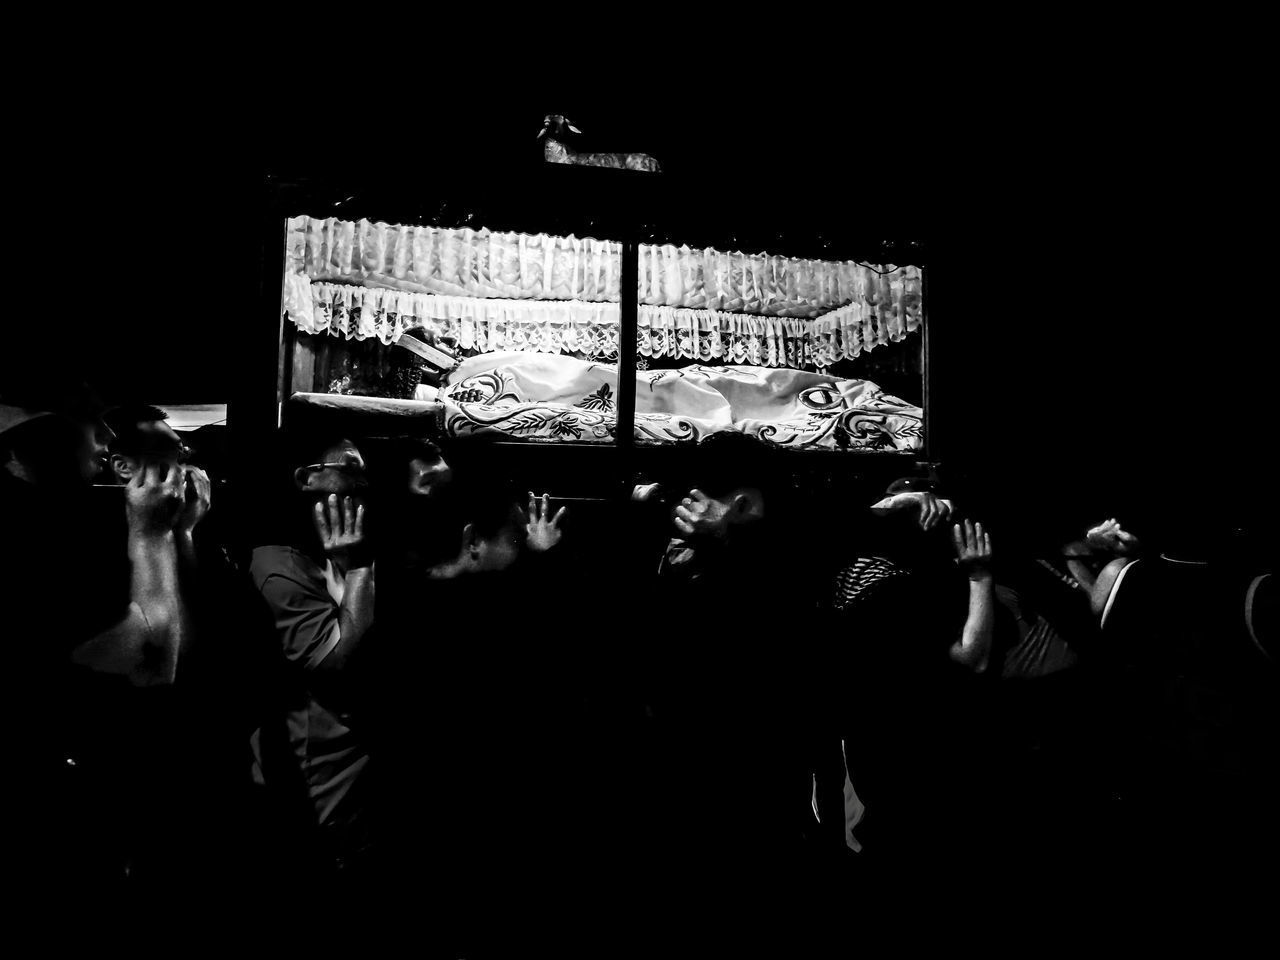 PEOPLE AT ILLUMINATED NIGHTCLUB